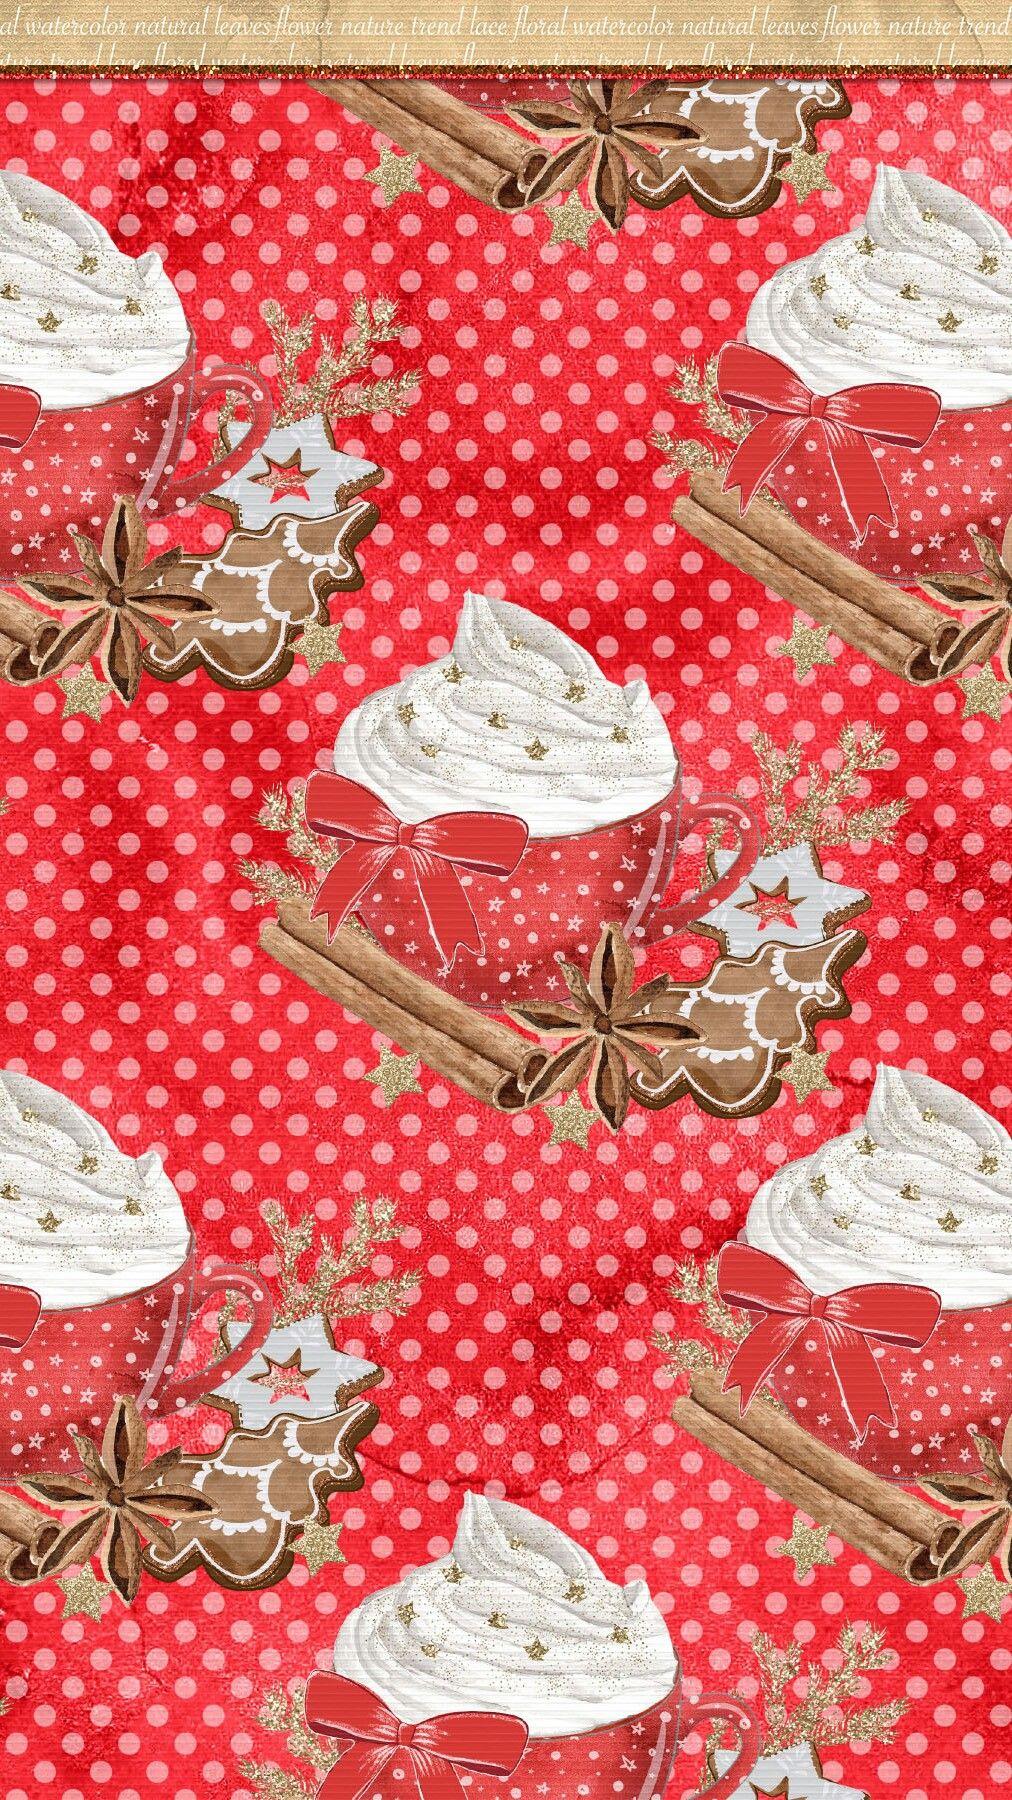 Download Wallpaper Home Screen Christmas - d0b5442073979e028696d42c5ef7ac02  Photograph_334012.jpg